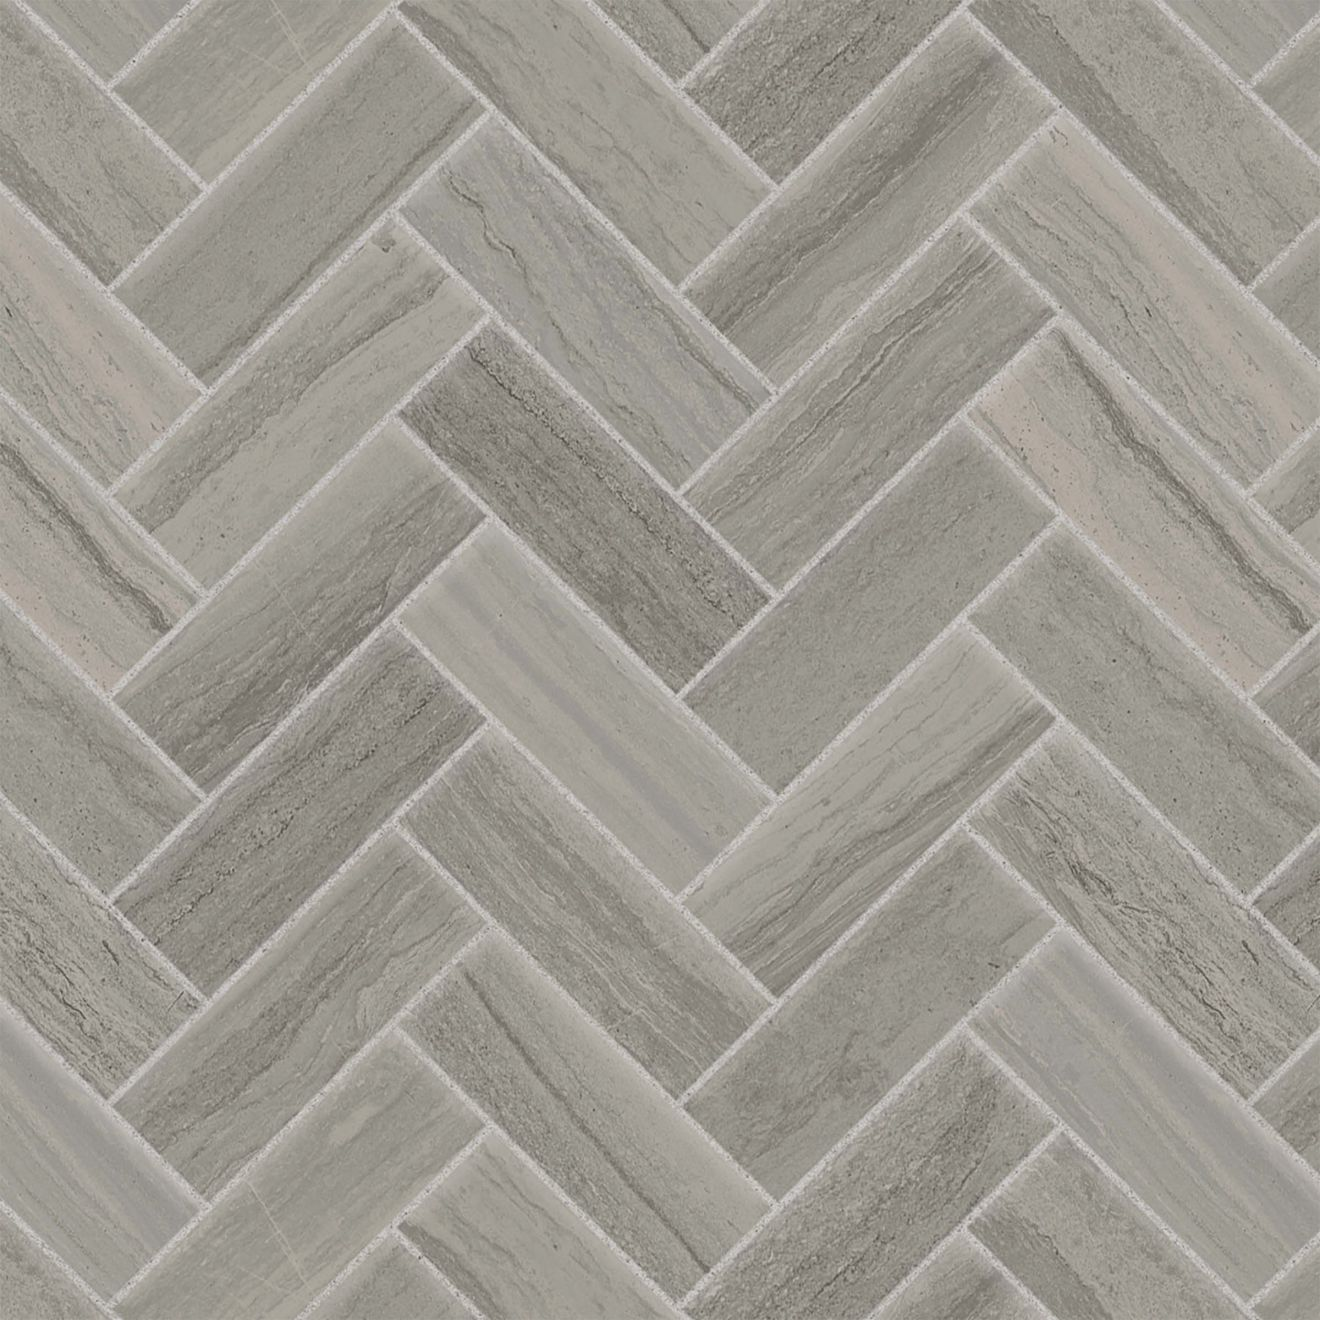 "Highland 1"" x 4"" Floor & Wall Mosaic in Greige"